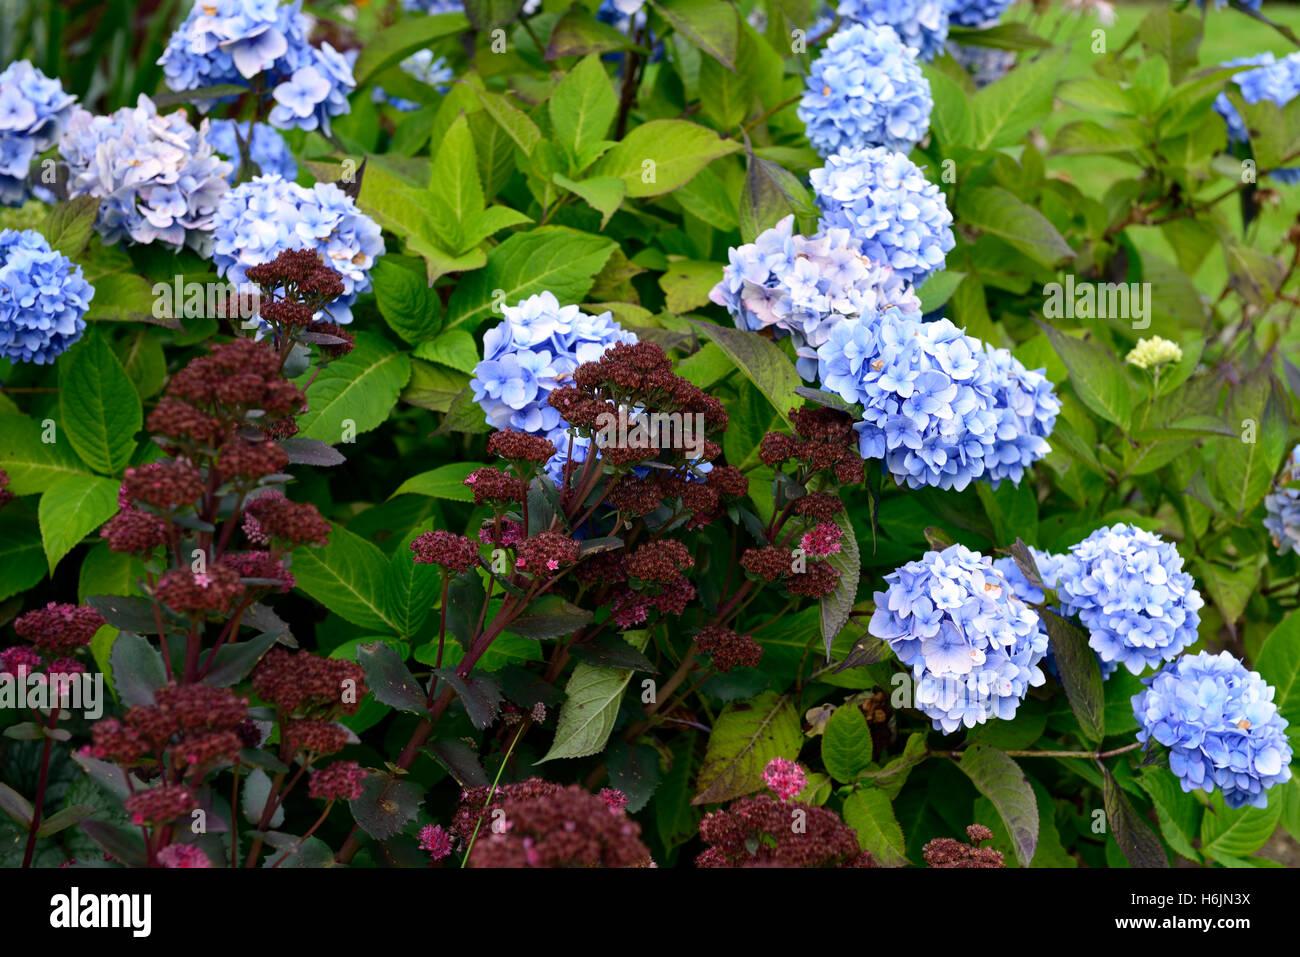 Sedum telephium jennifer blue mophead hydrangea purple flower sedum telephium jennifer blue mophead hydrangea purple flower flowers flowering combination garden gardens rm floral altavistaventures Images